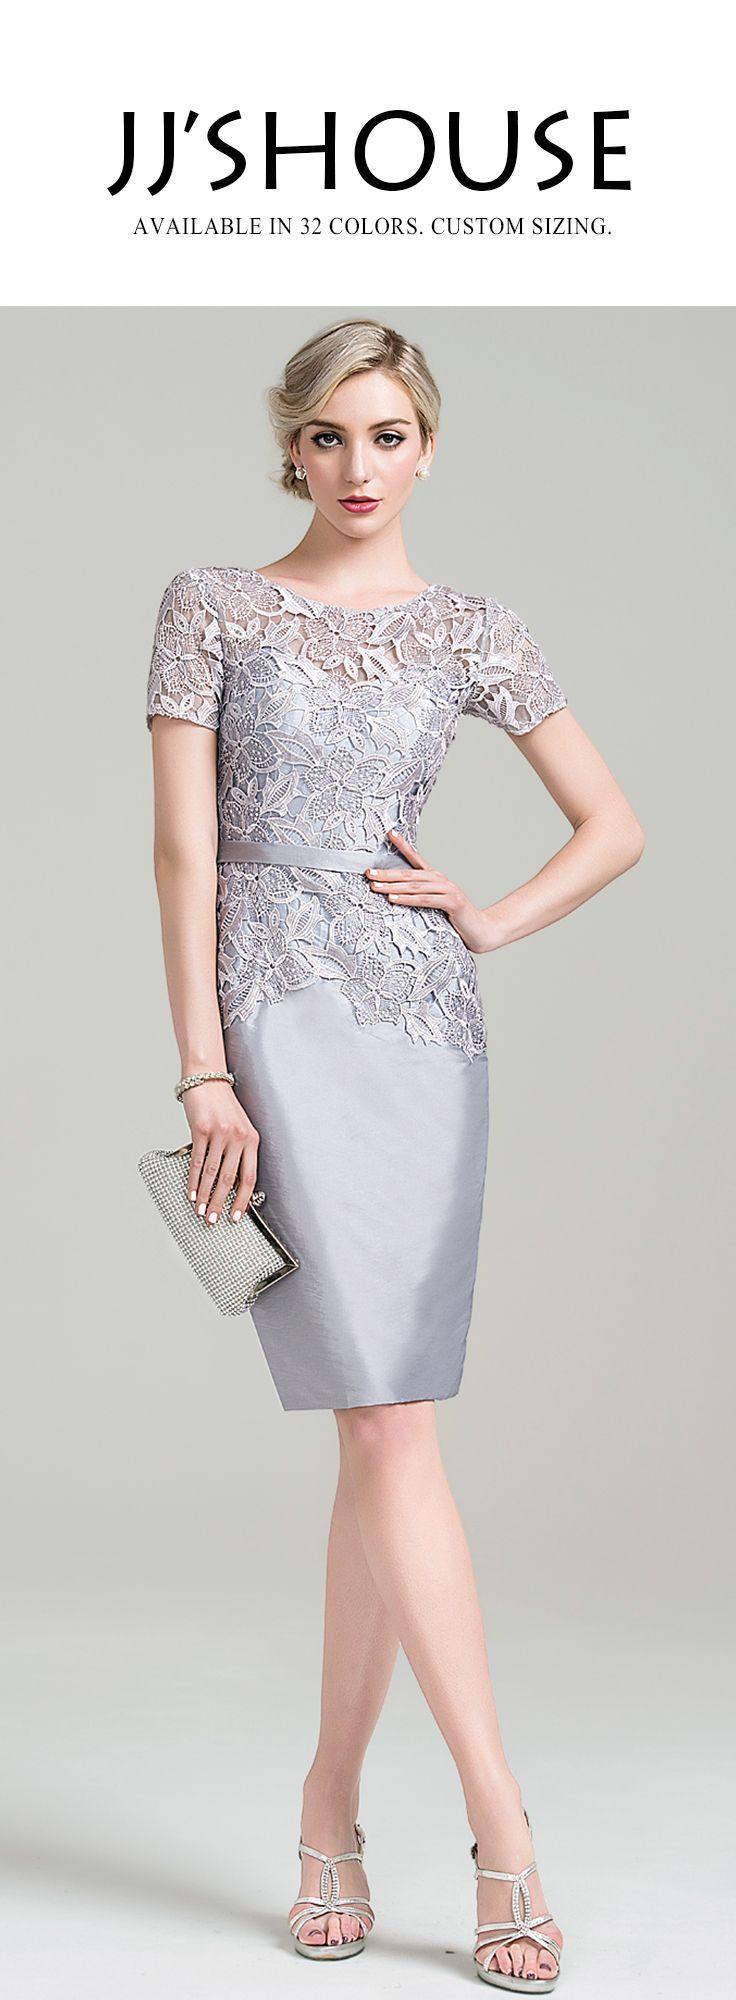 Batik dress for wedding party  SheathColumn Scoop Neck KneeLength Taffeta Lace Mother of the